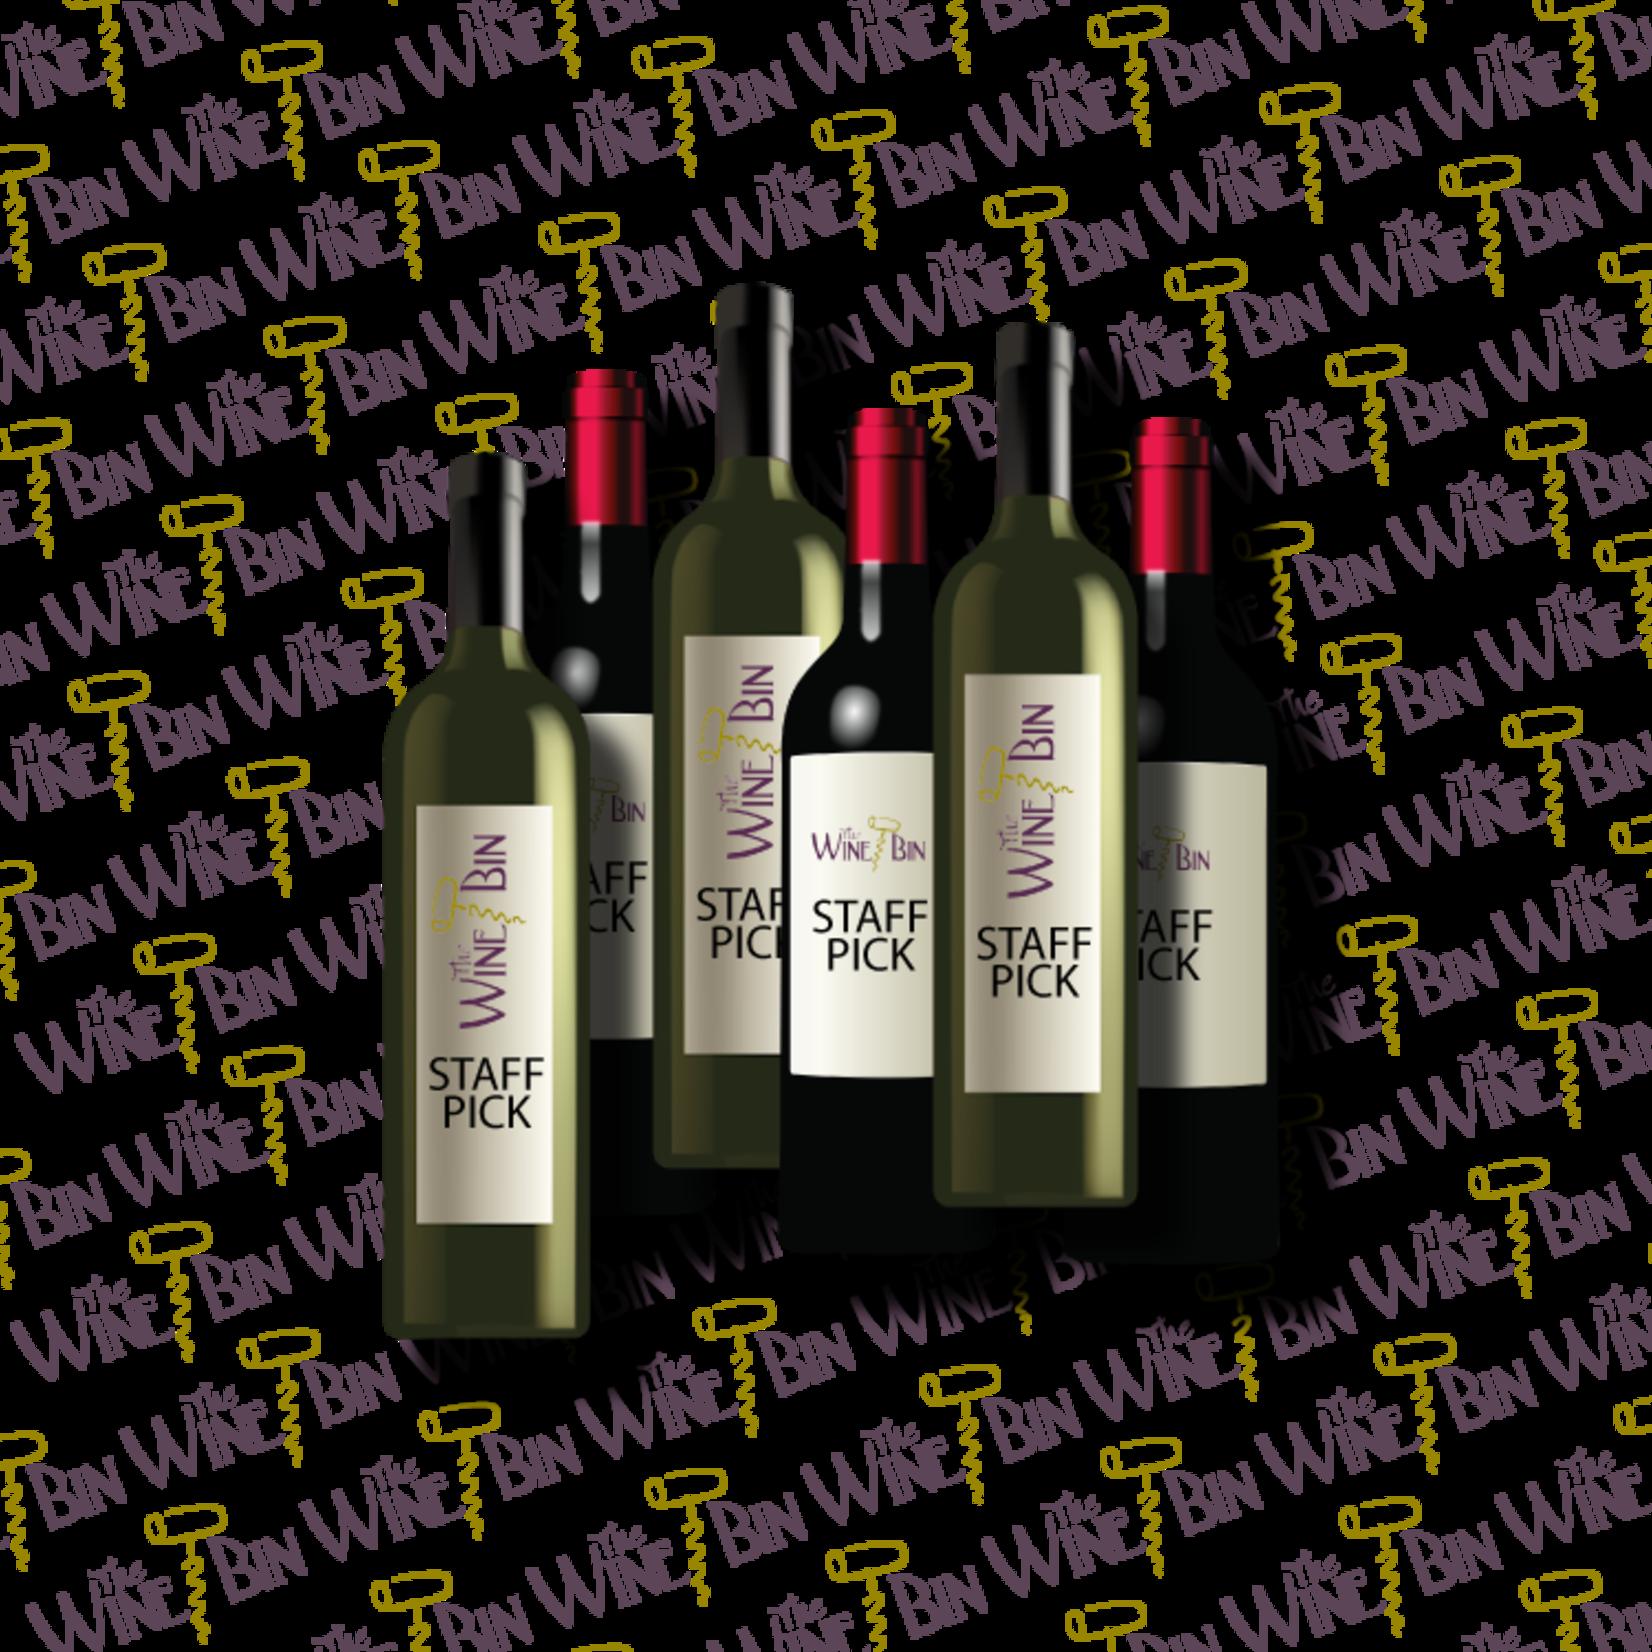 The Wine Bin STAFF 6 • SEPTEMBER • The Wine Bin